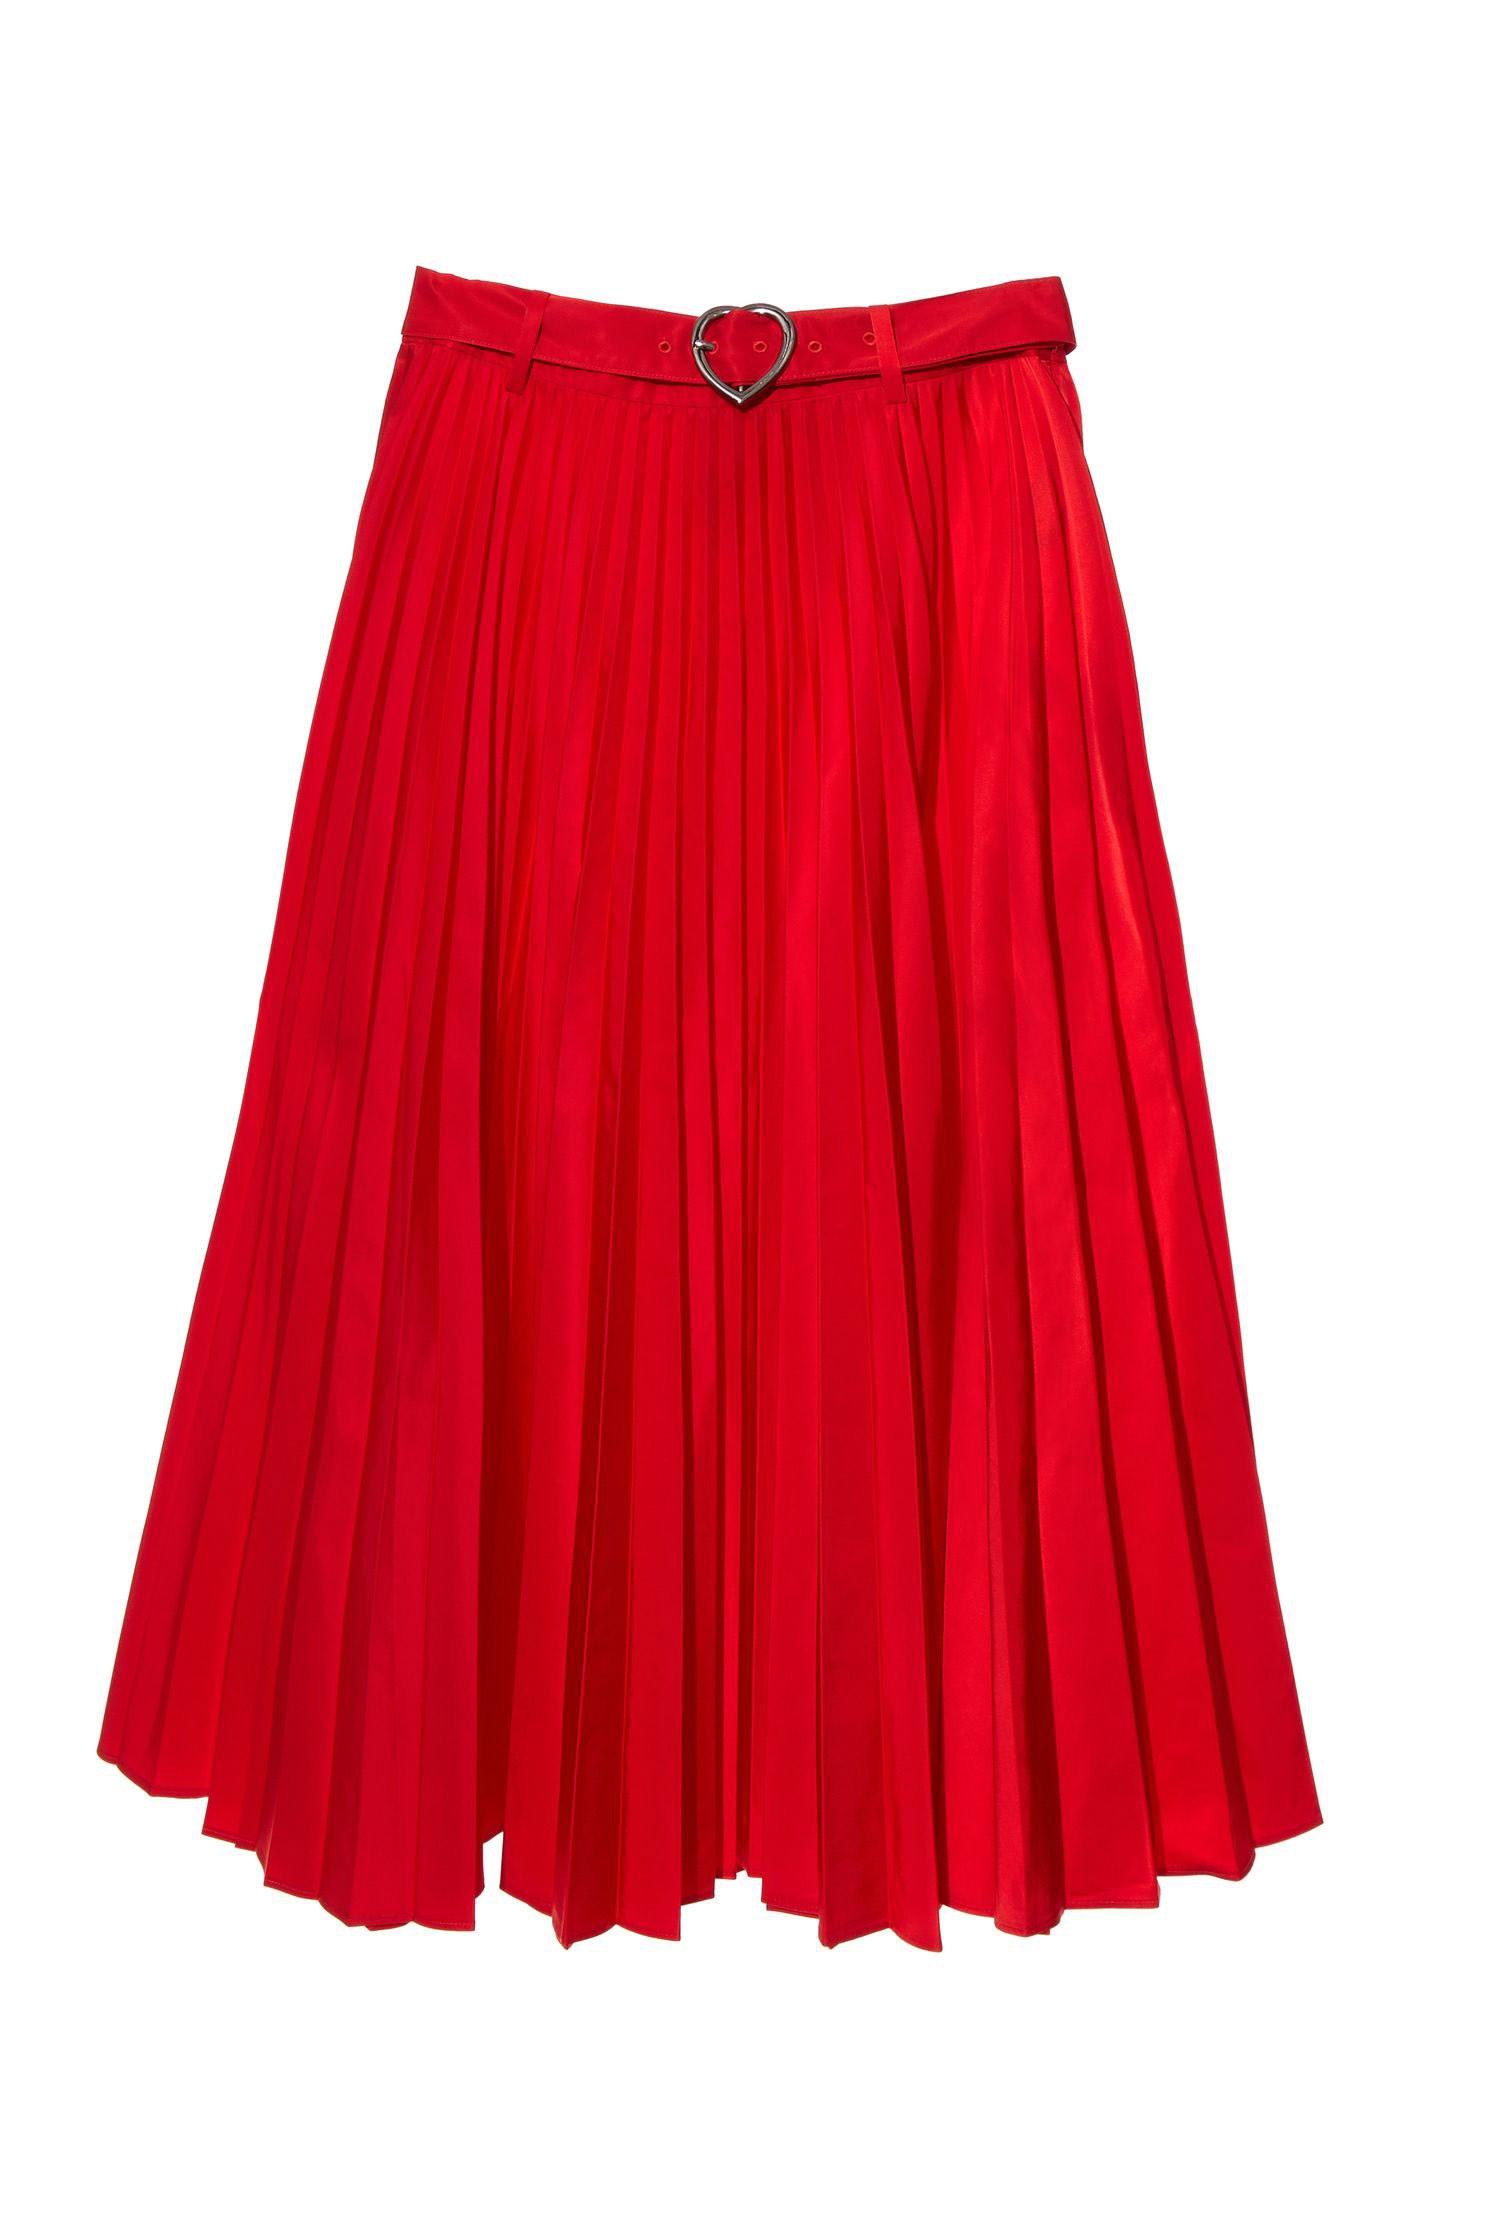 Mid-waist folds and knee skirt